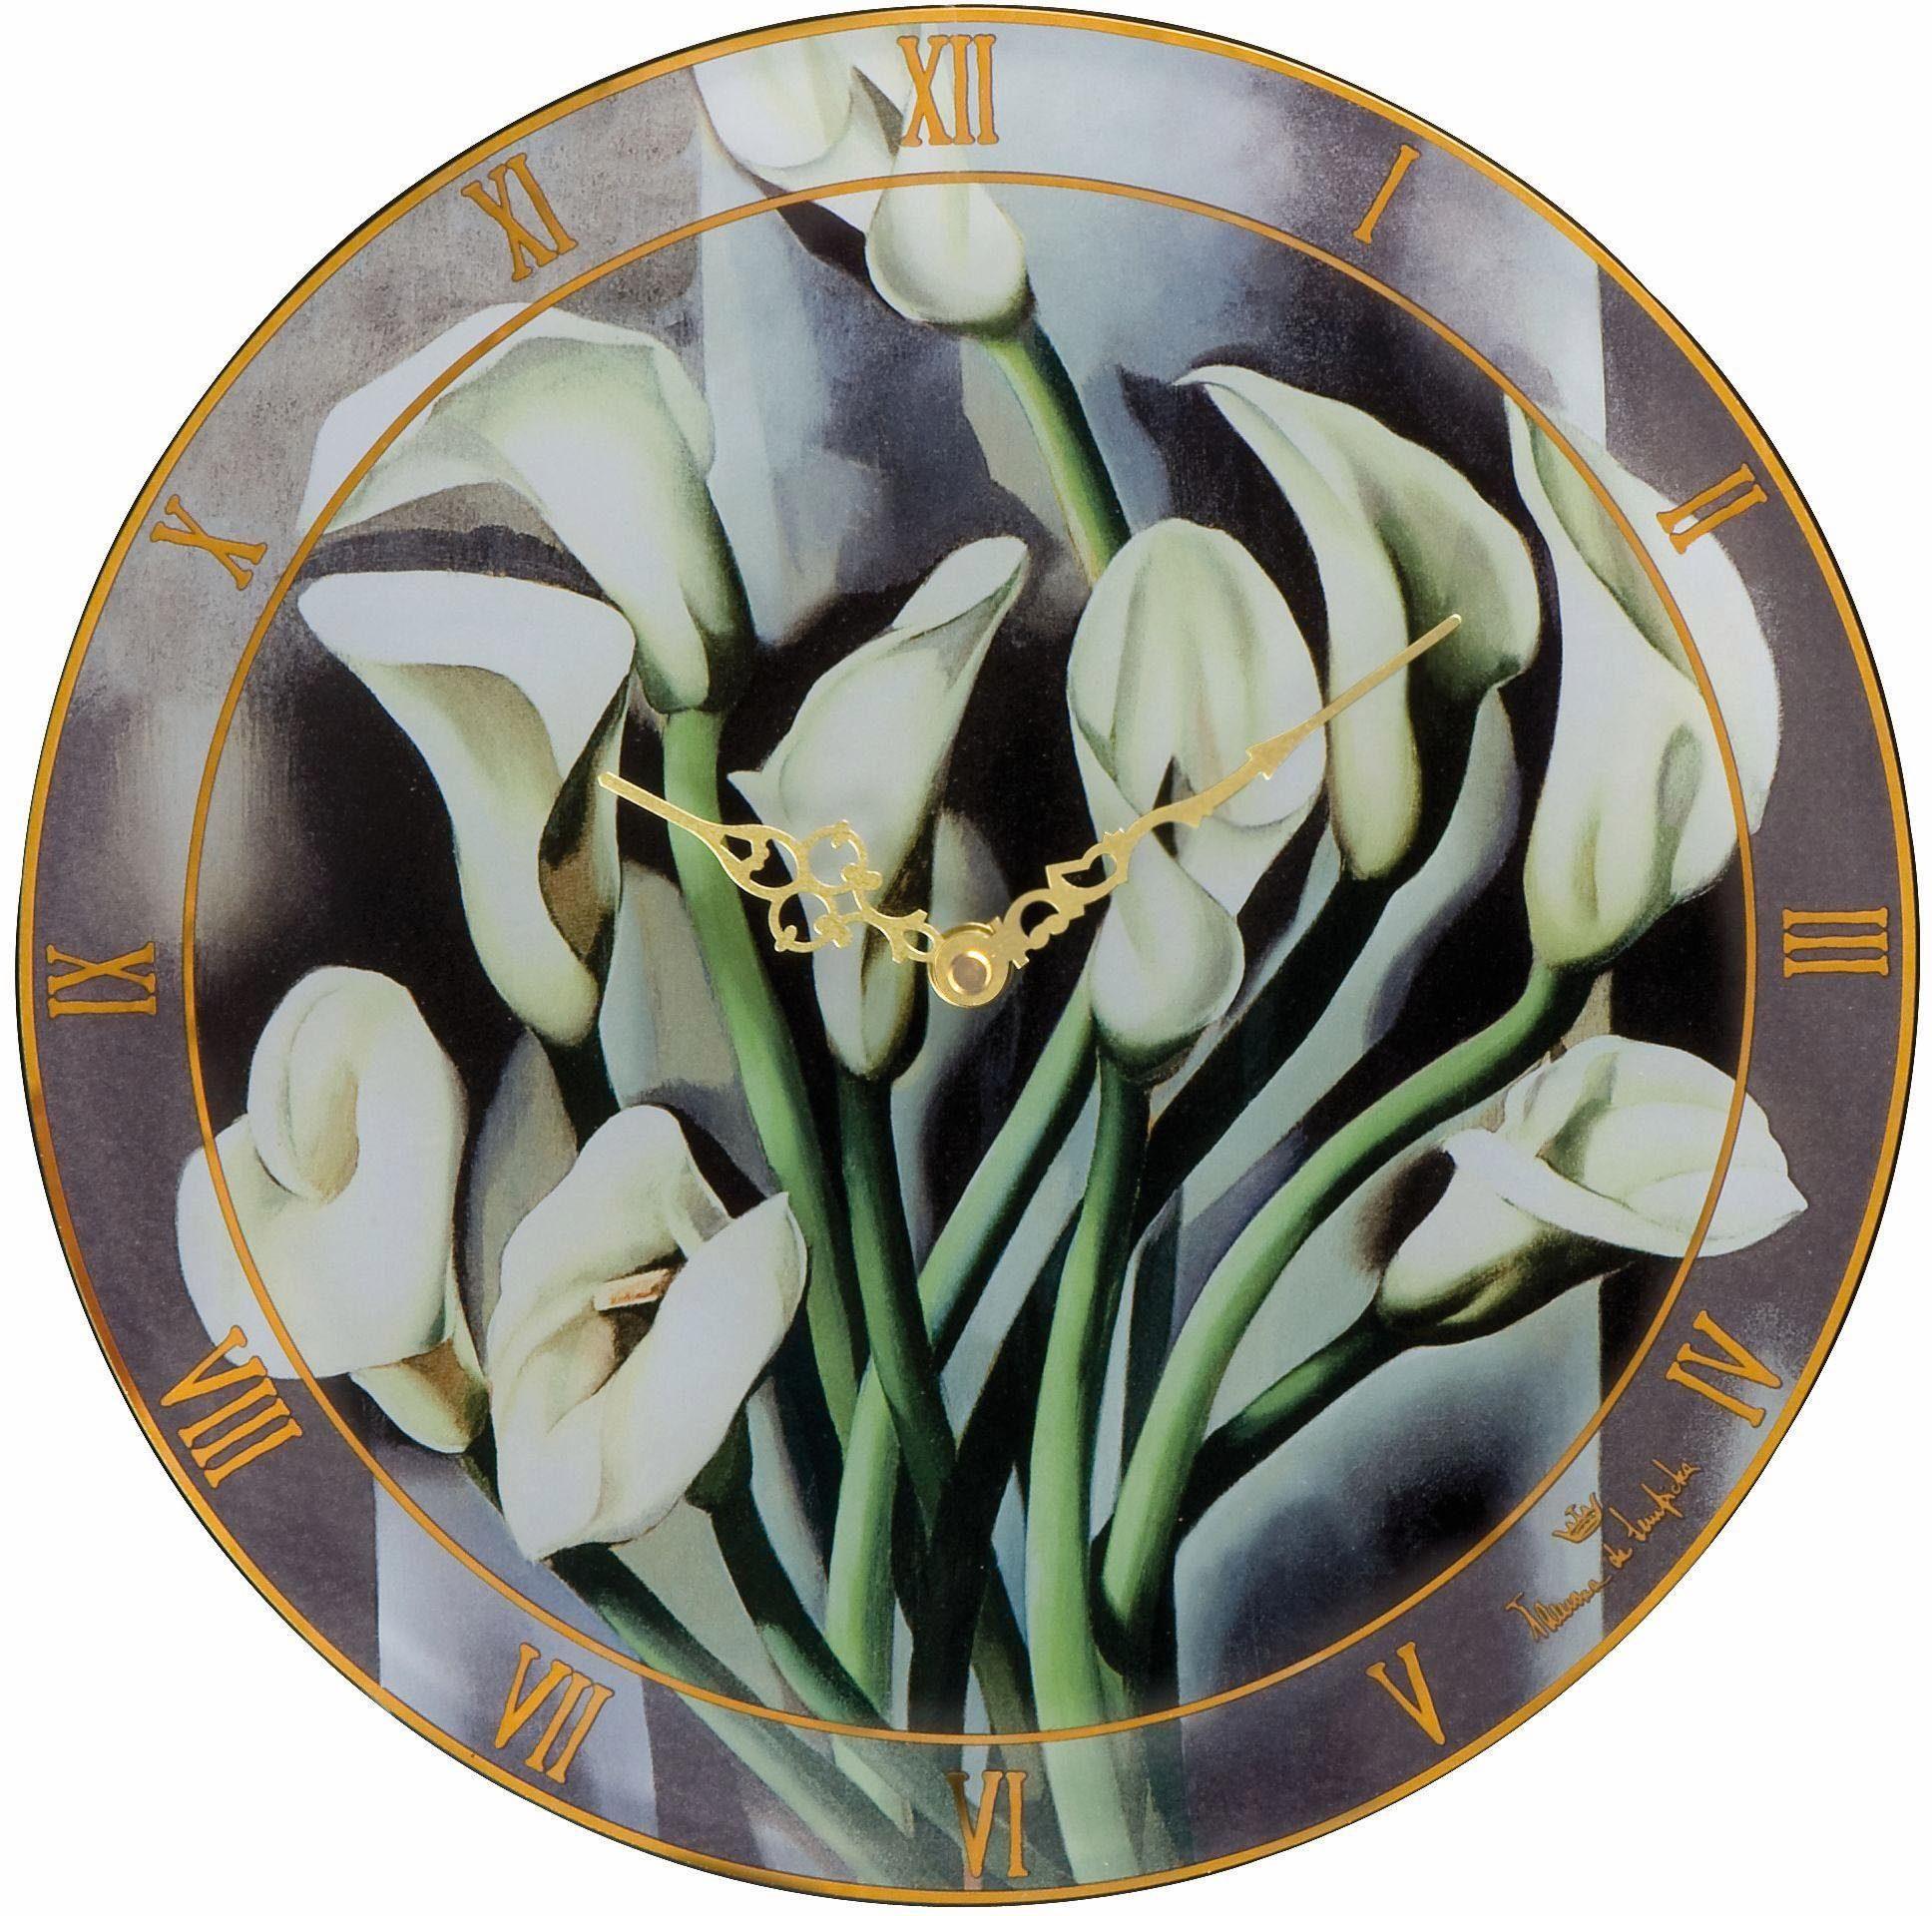 Goebel Wanduhr »Artis Orbis, Callas I, 67070131«